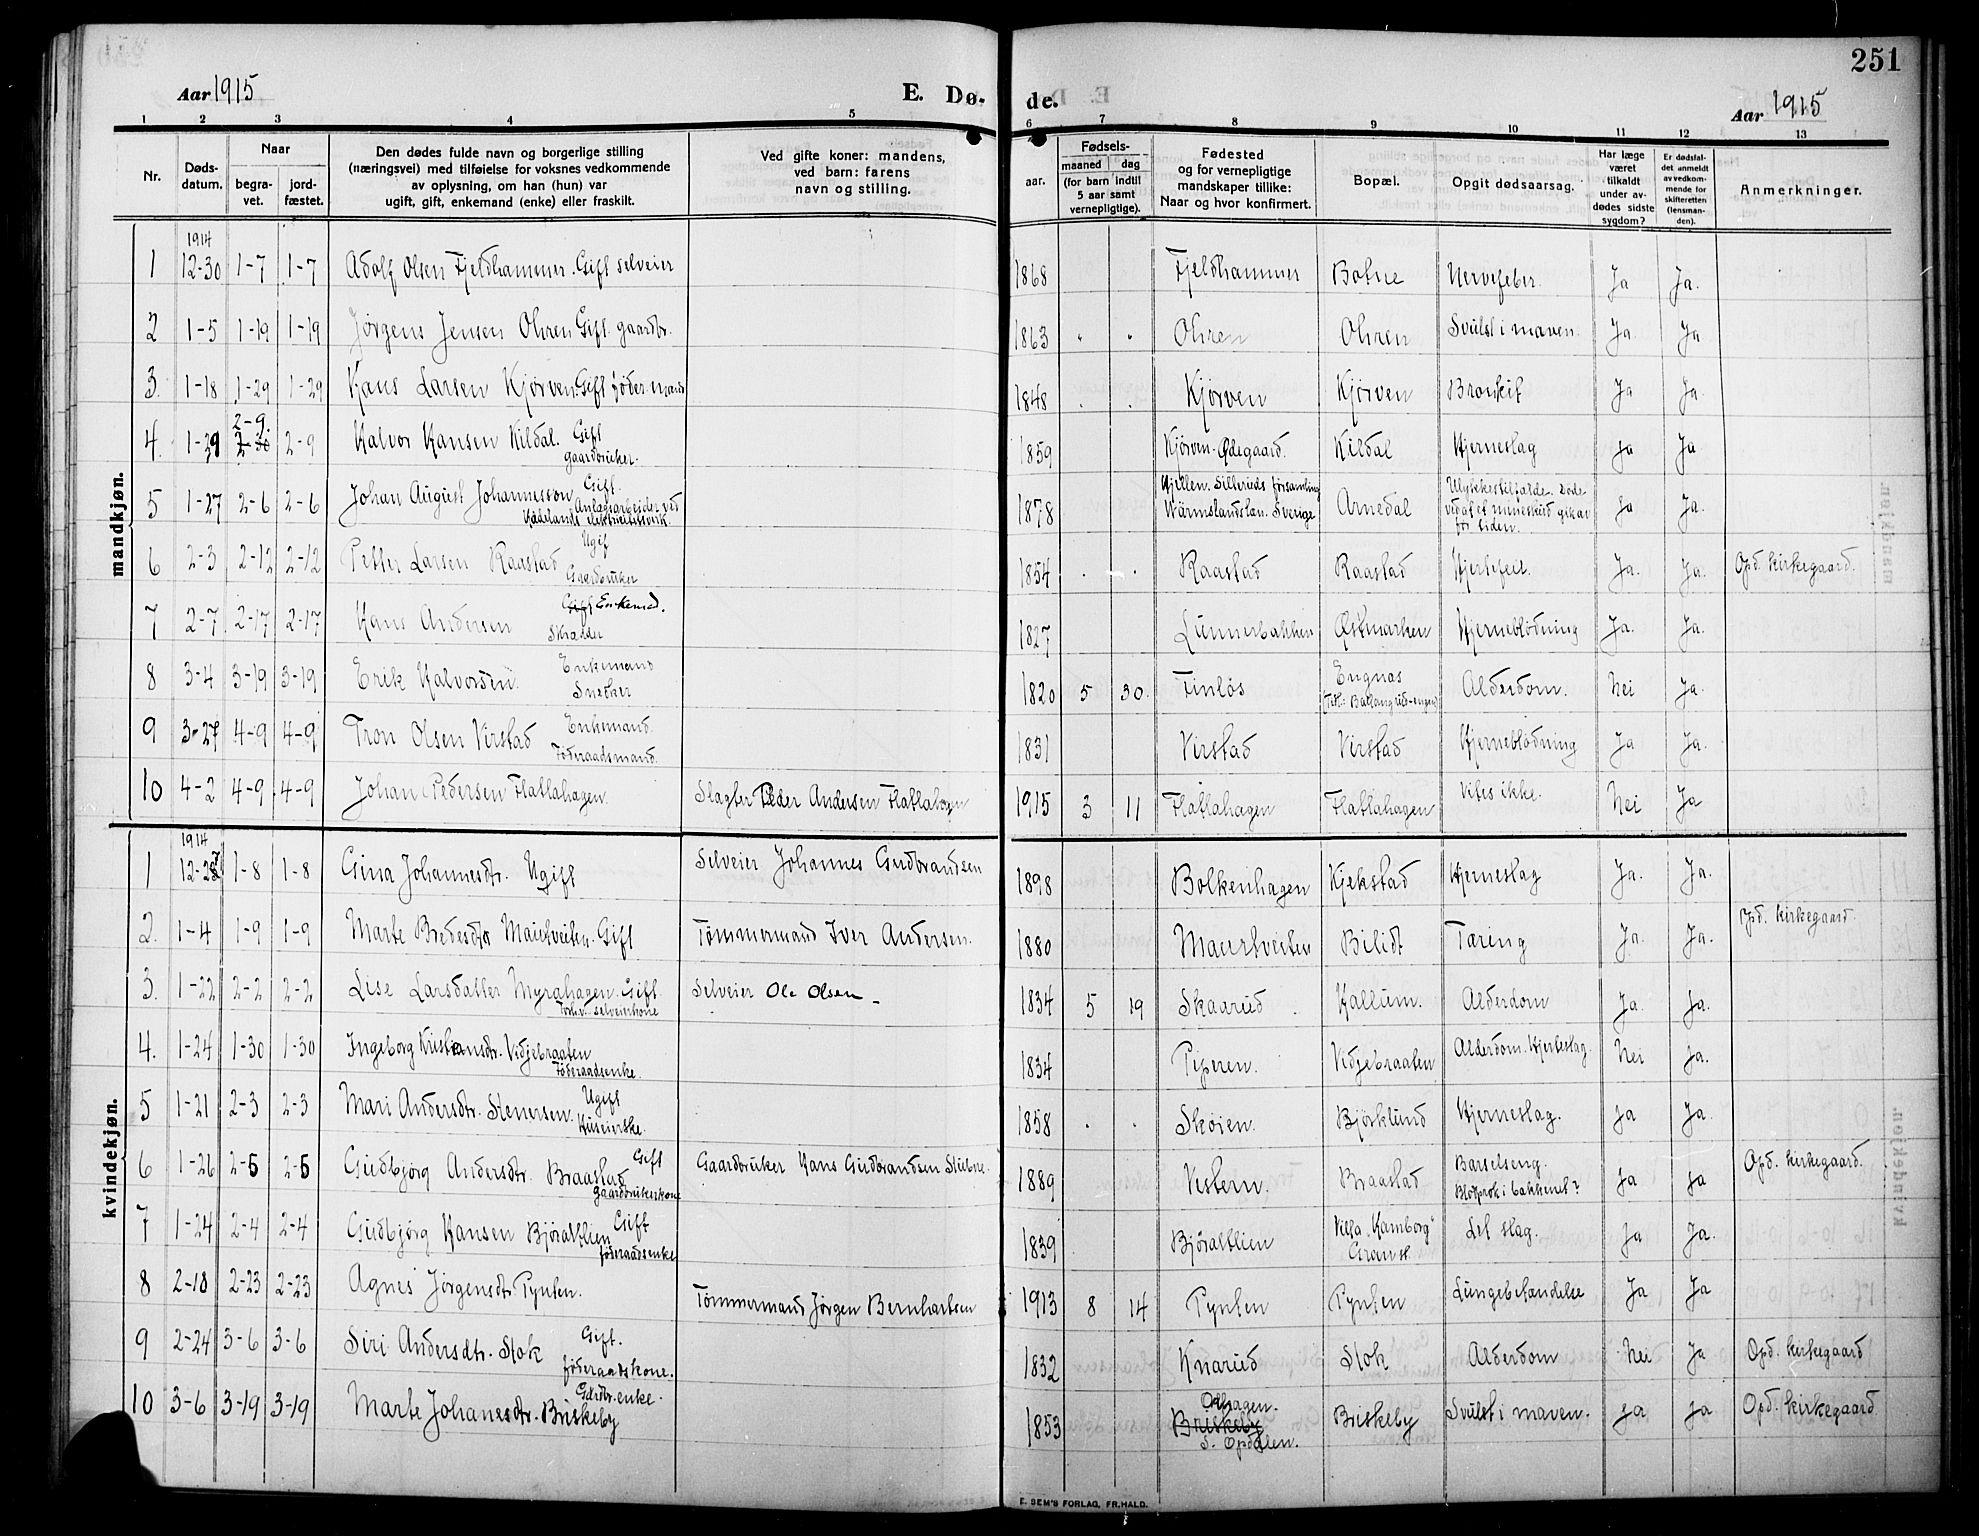 SAH, Lunner prestekontor, H/Ha/Hab/L0001: Klokkerbok nr. 1, 1909-1922, s. 251